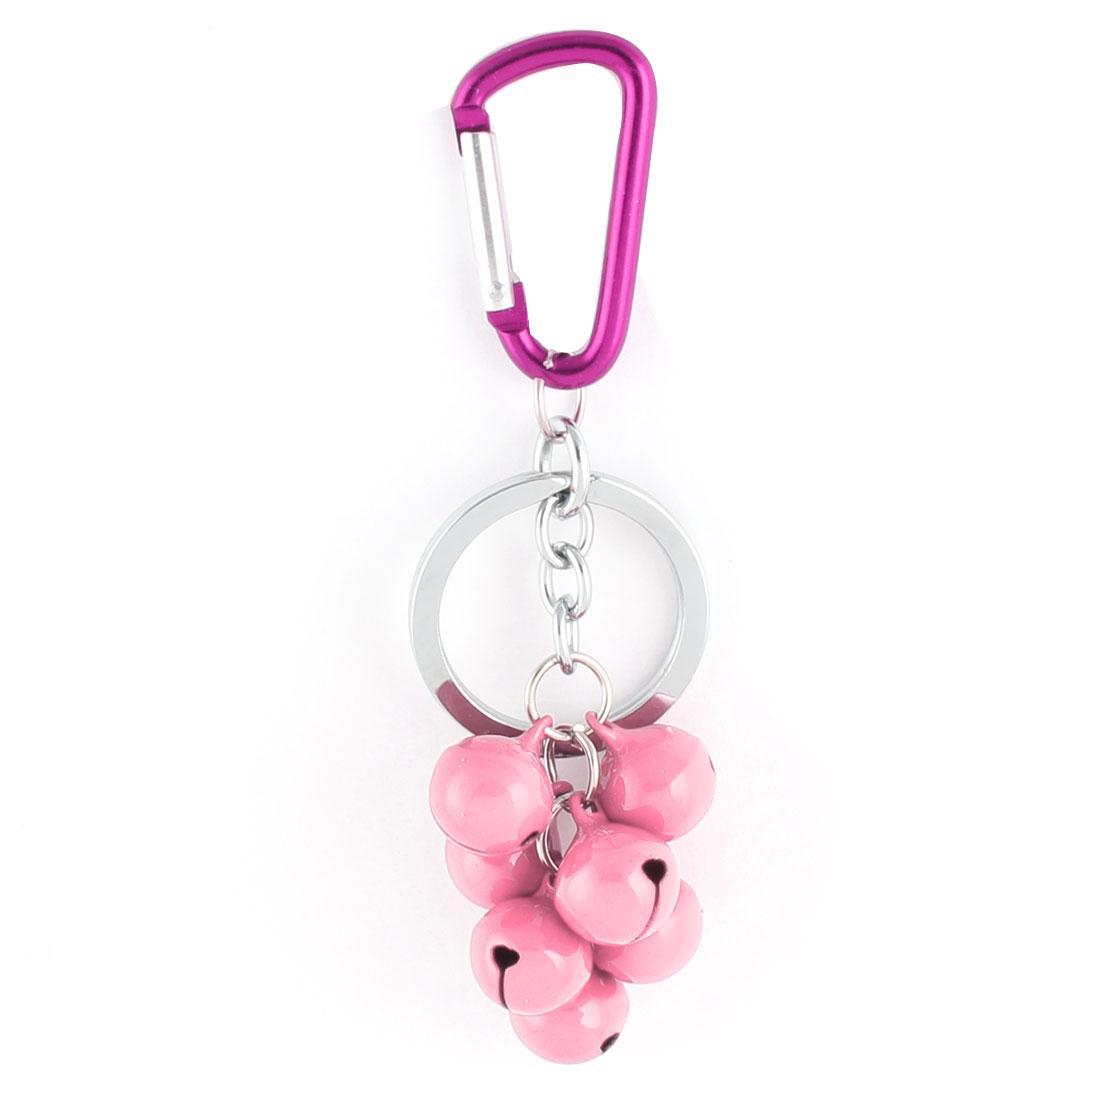 Metal Carabiner 7 Bell Pendant Key Ring Holder Handbag Decoration Pink